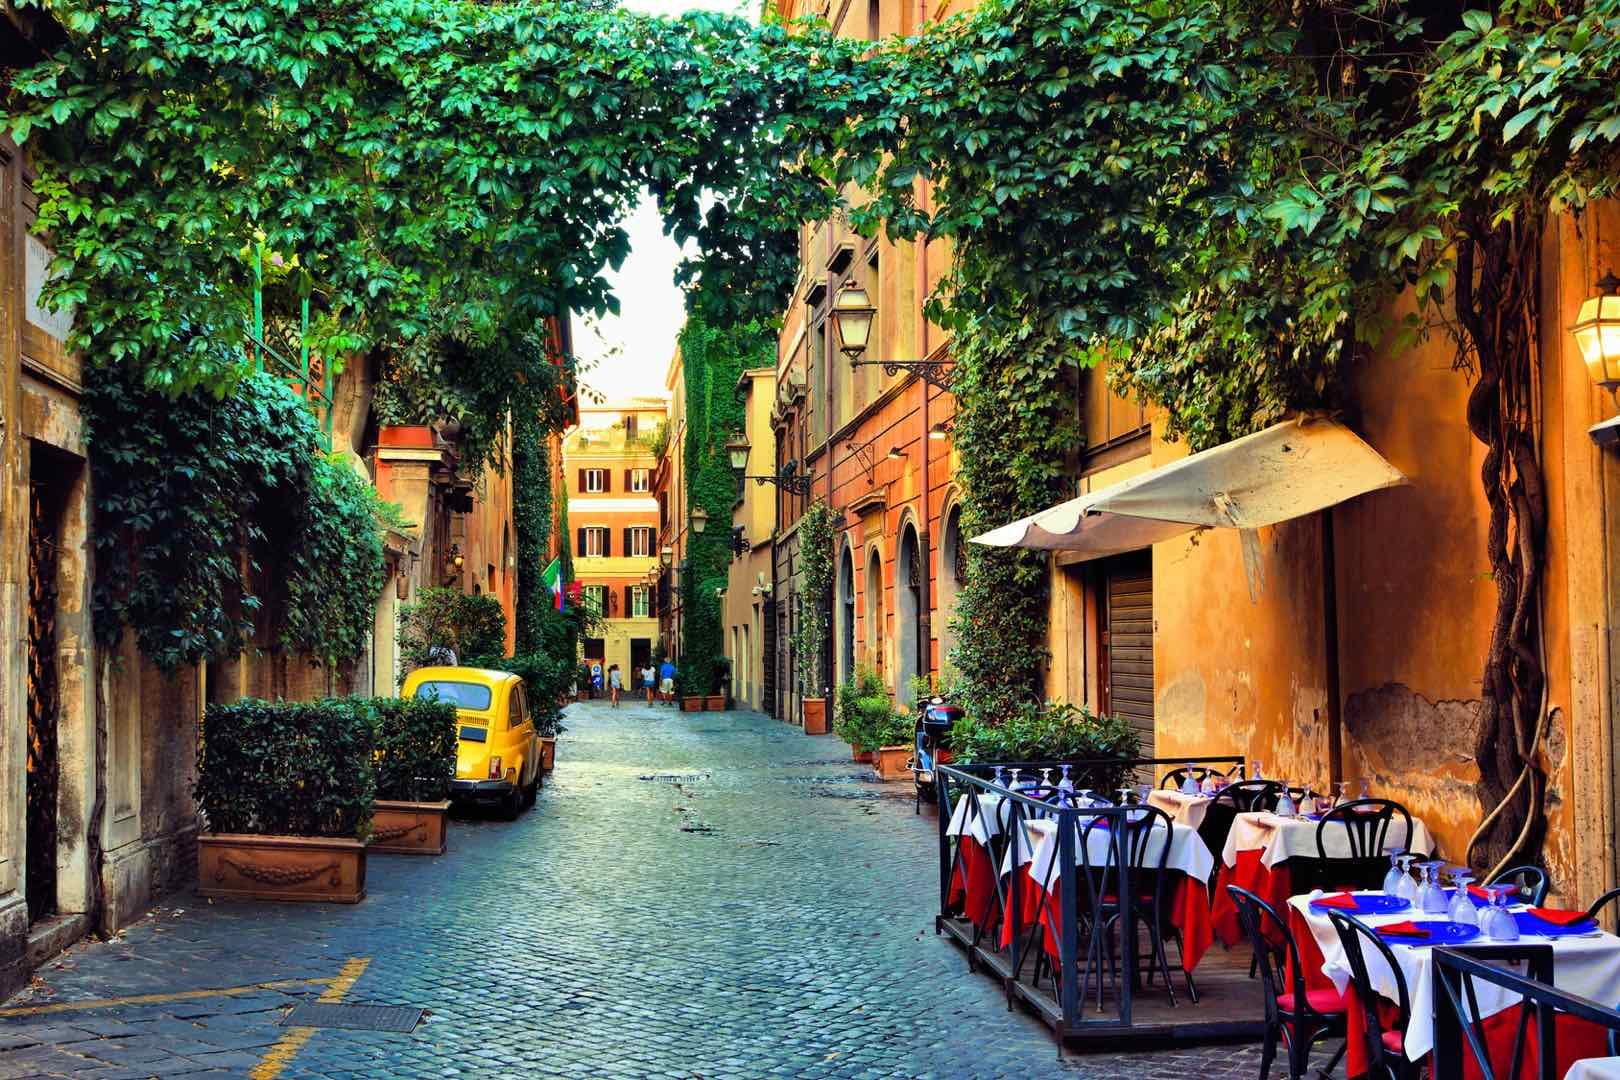 streeet in Rome's Monti neighborhood